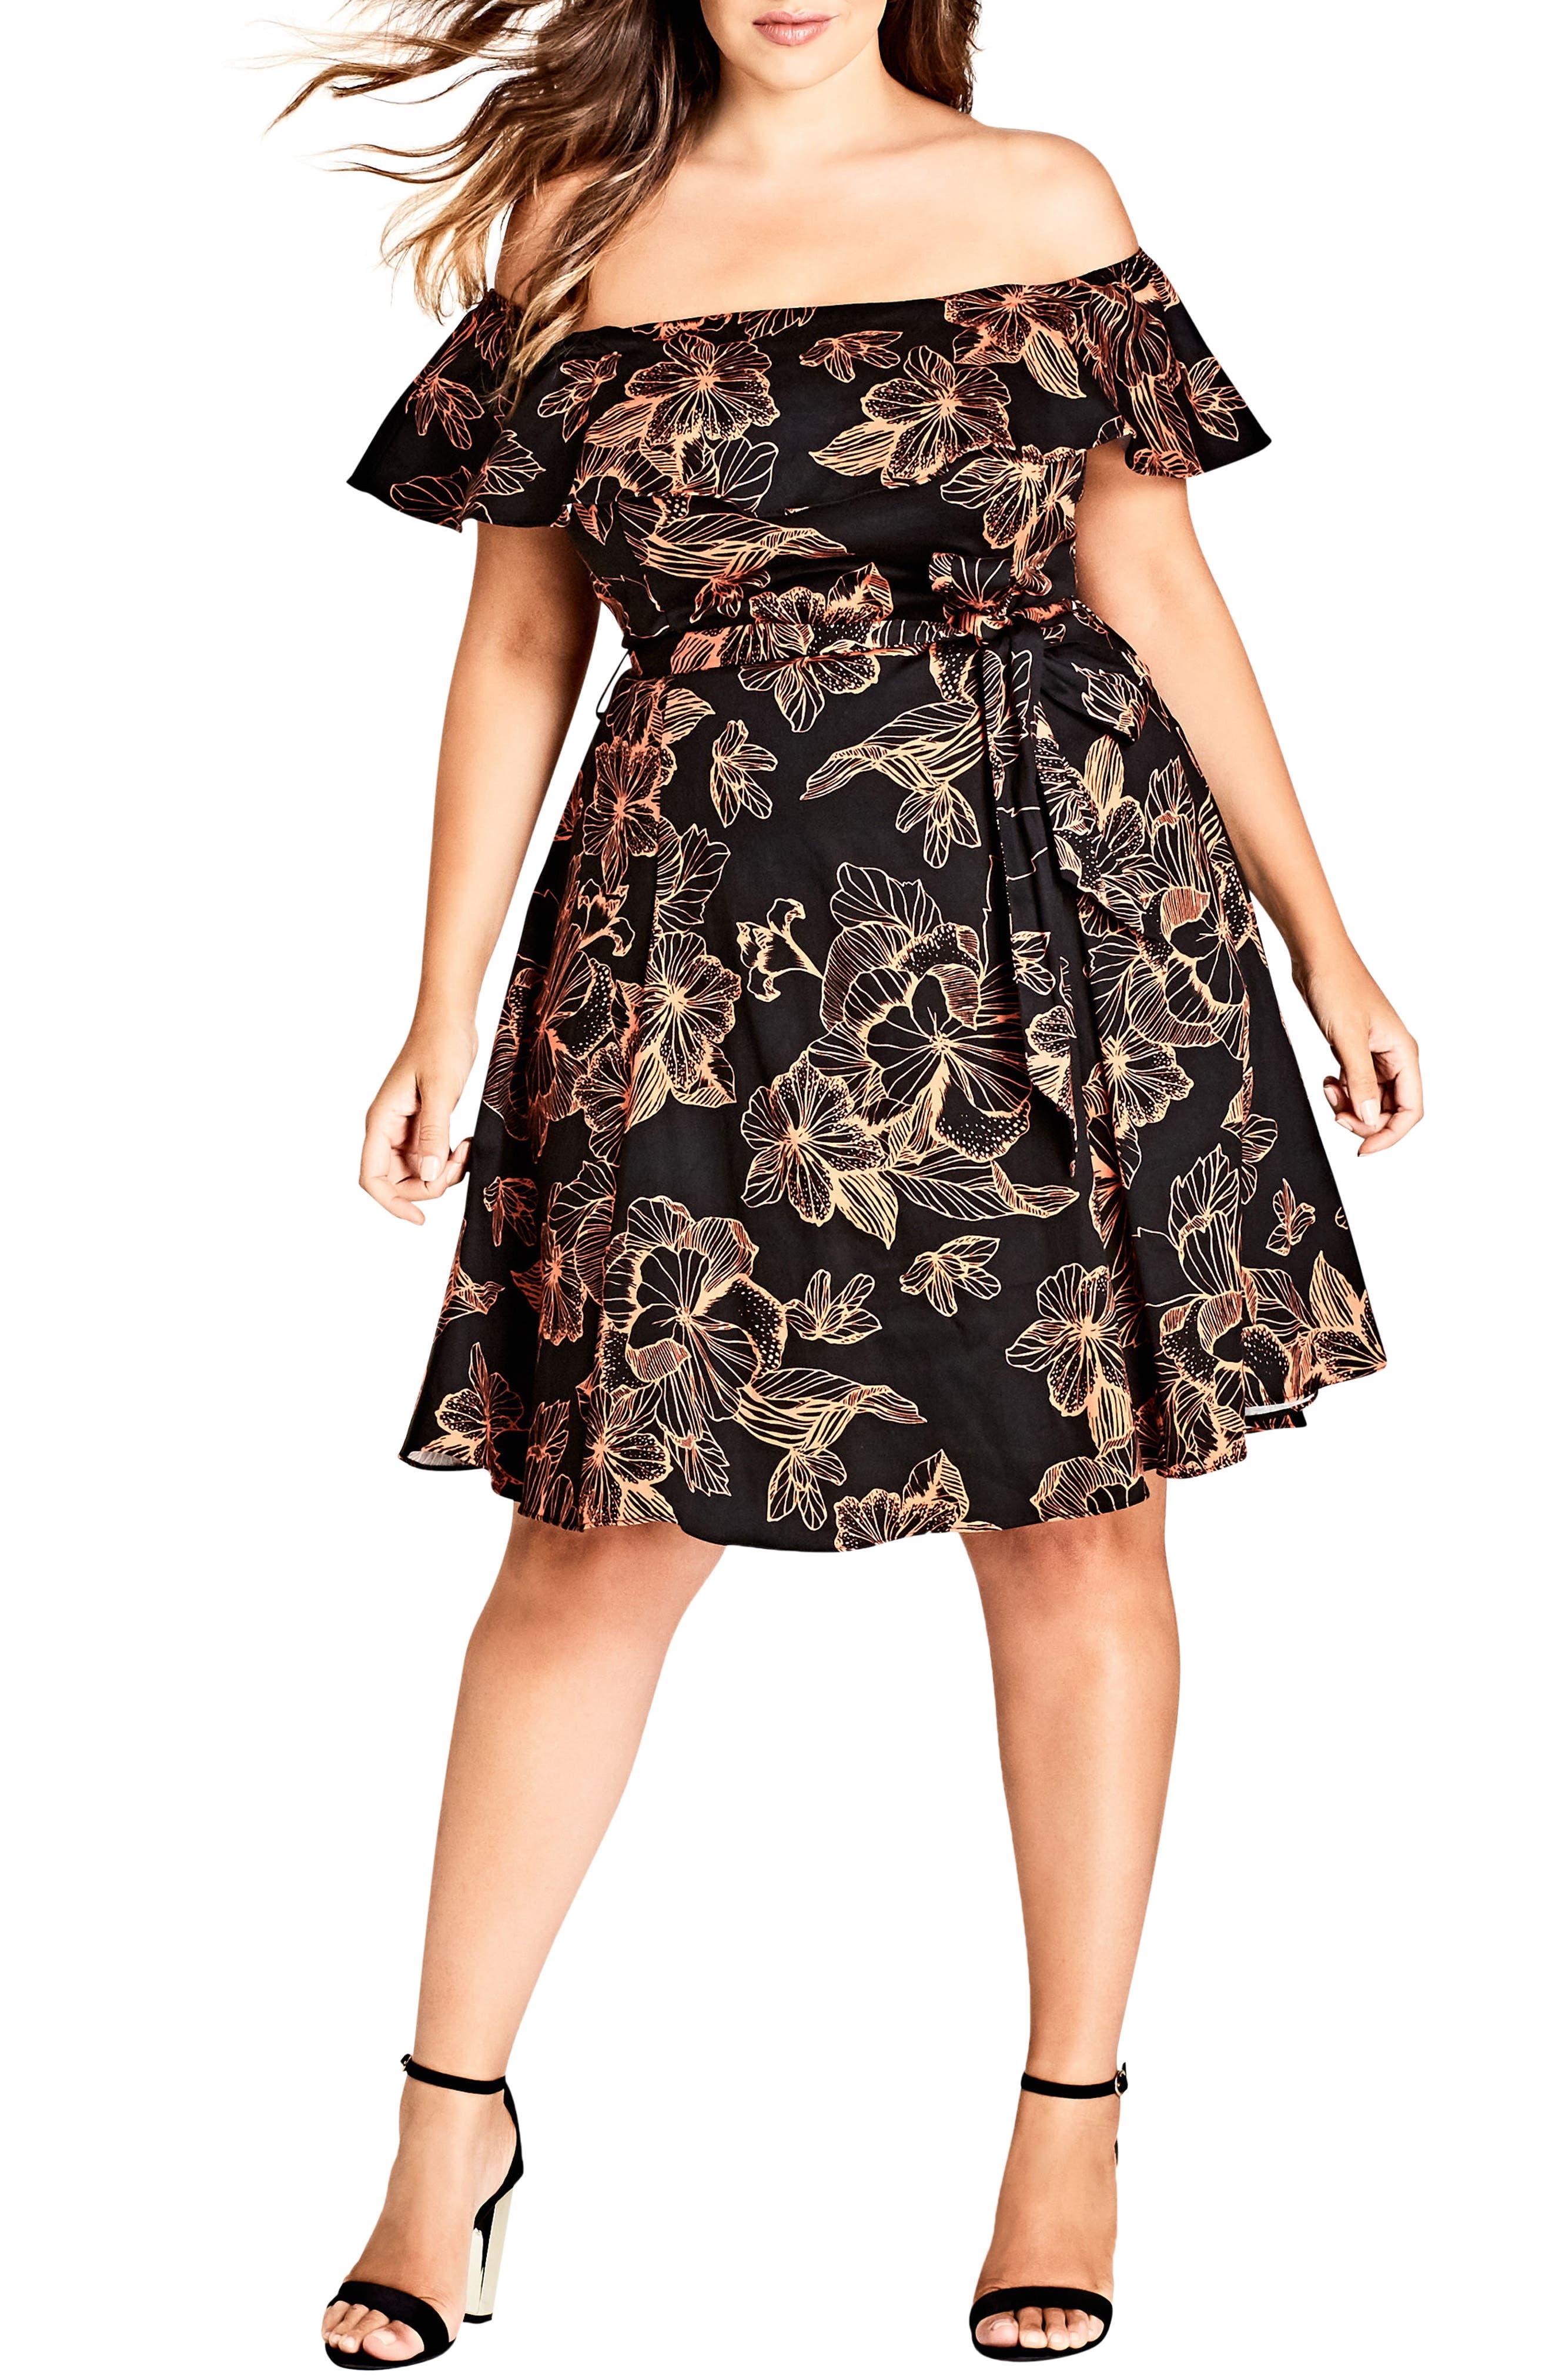 City Chic Floral Off the Shoulder Fit & Flare Dress (Plus Size)